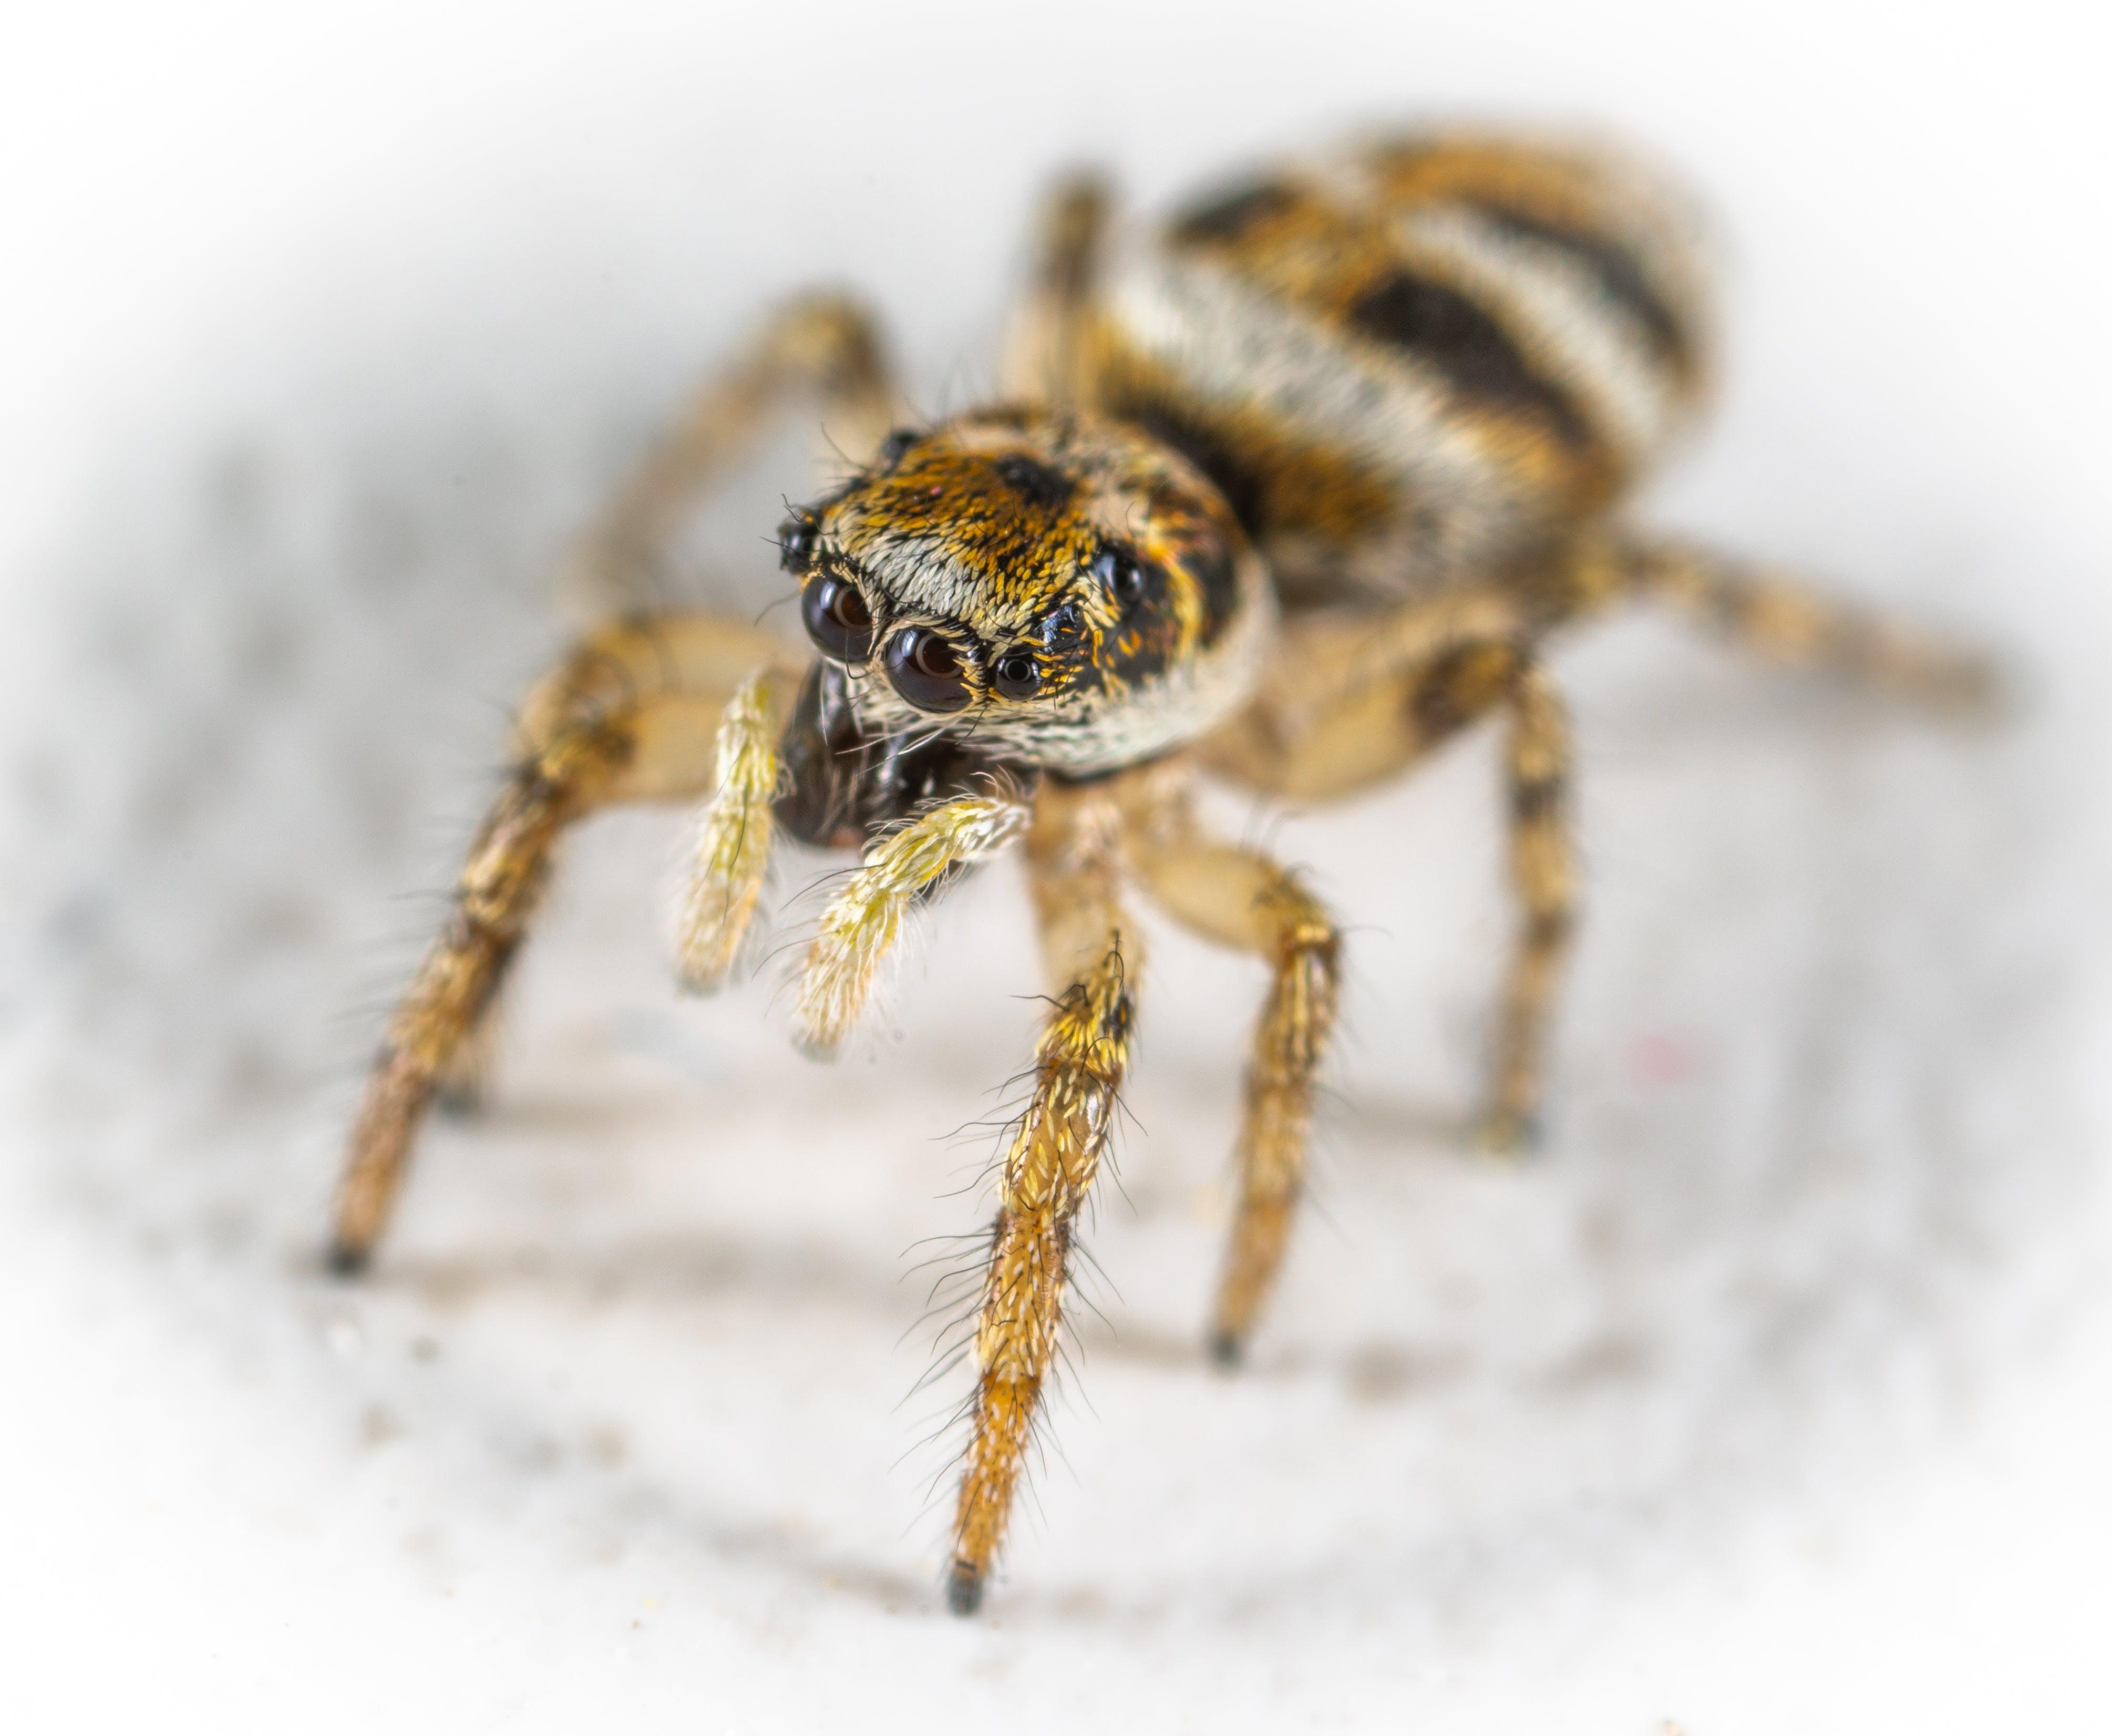 Close-Up Photo Spider